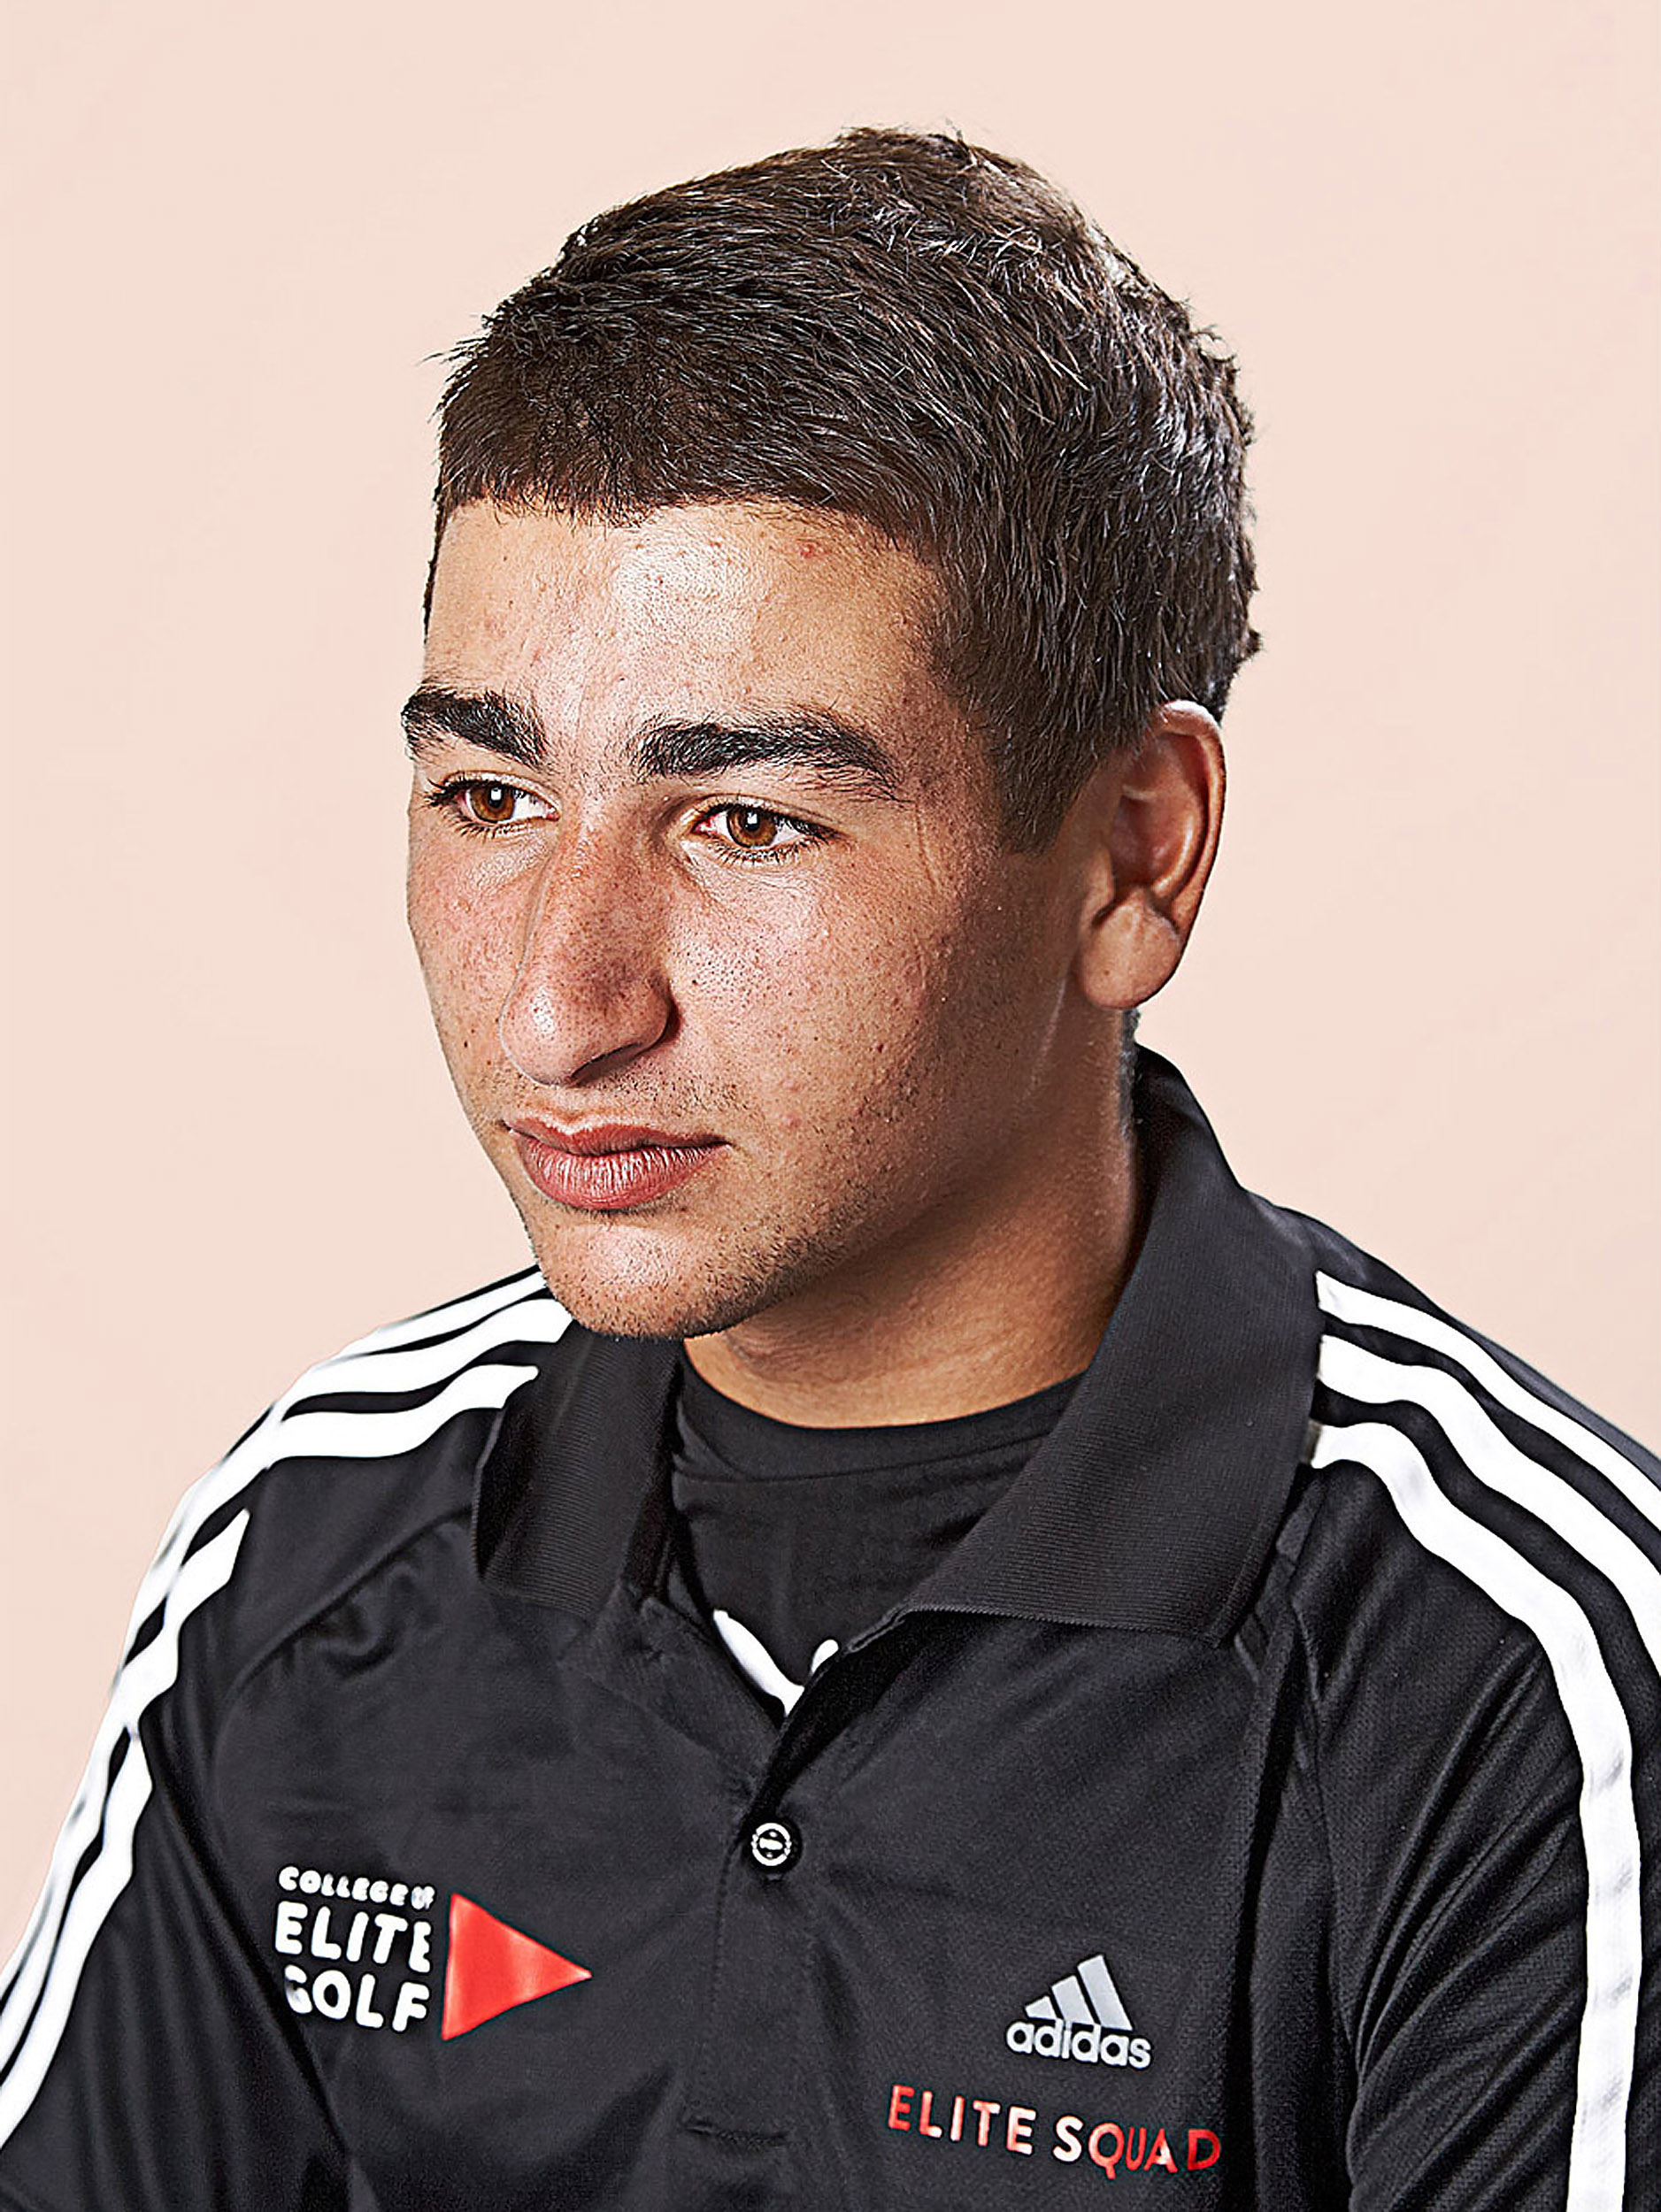 Nathan for Adidas Elite Squad